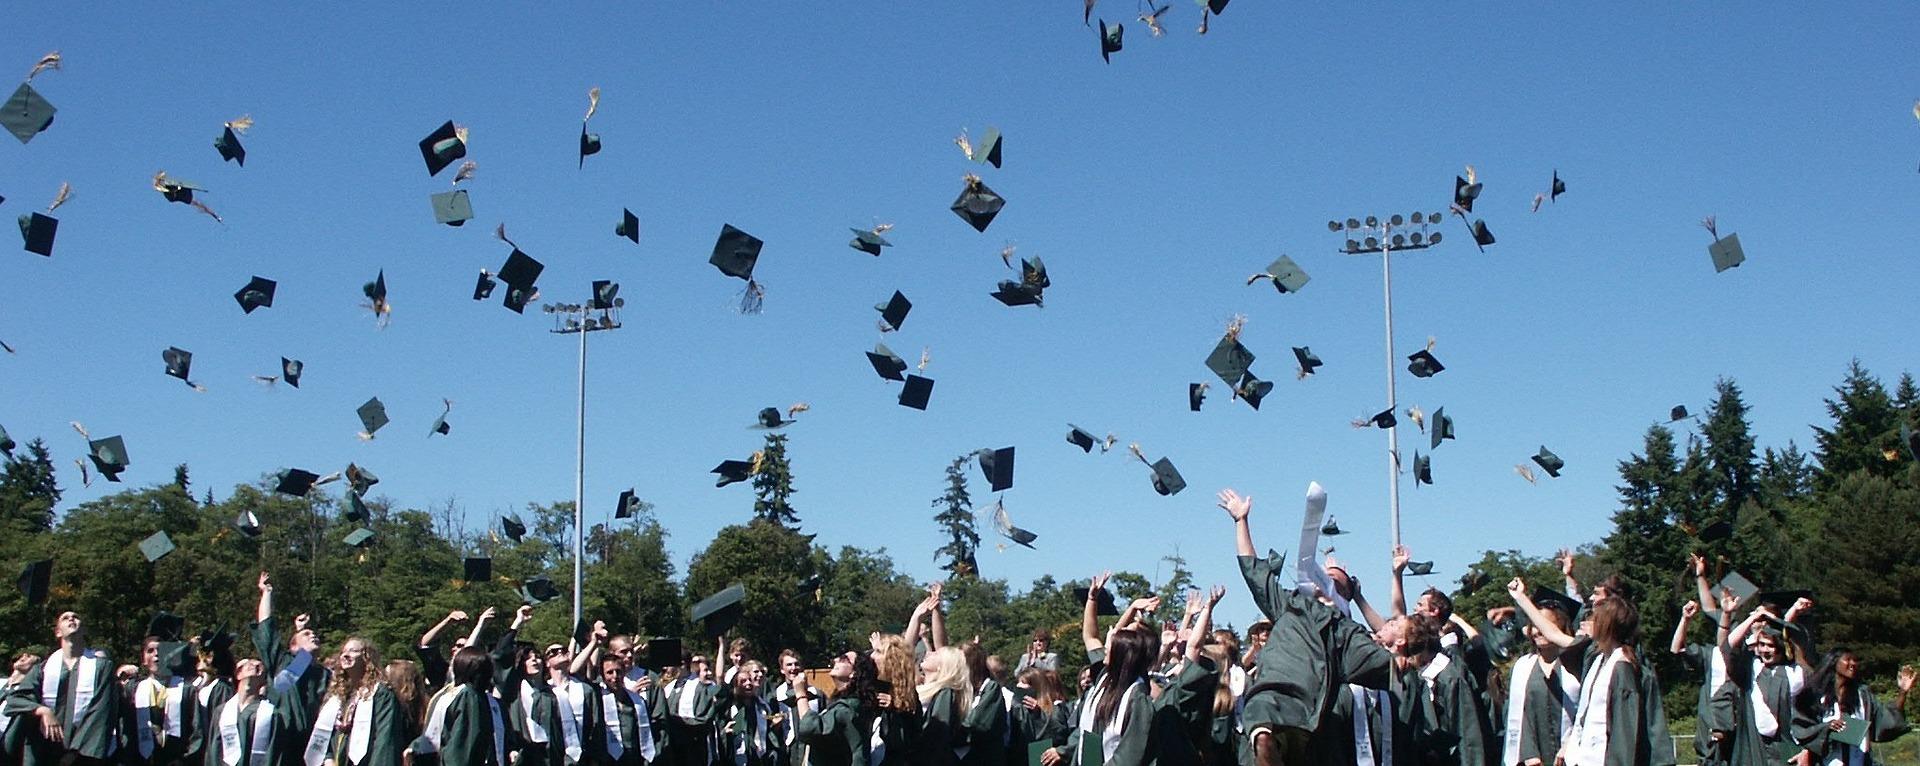 graduation-995042_1920.jpg